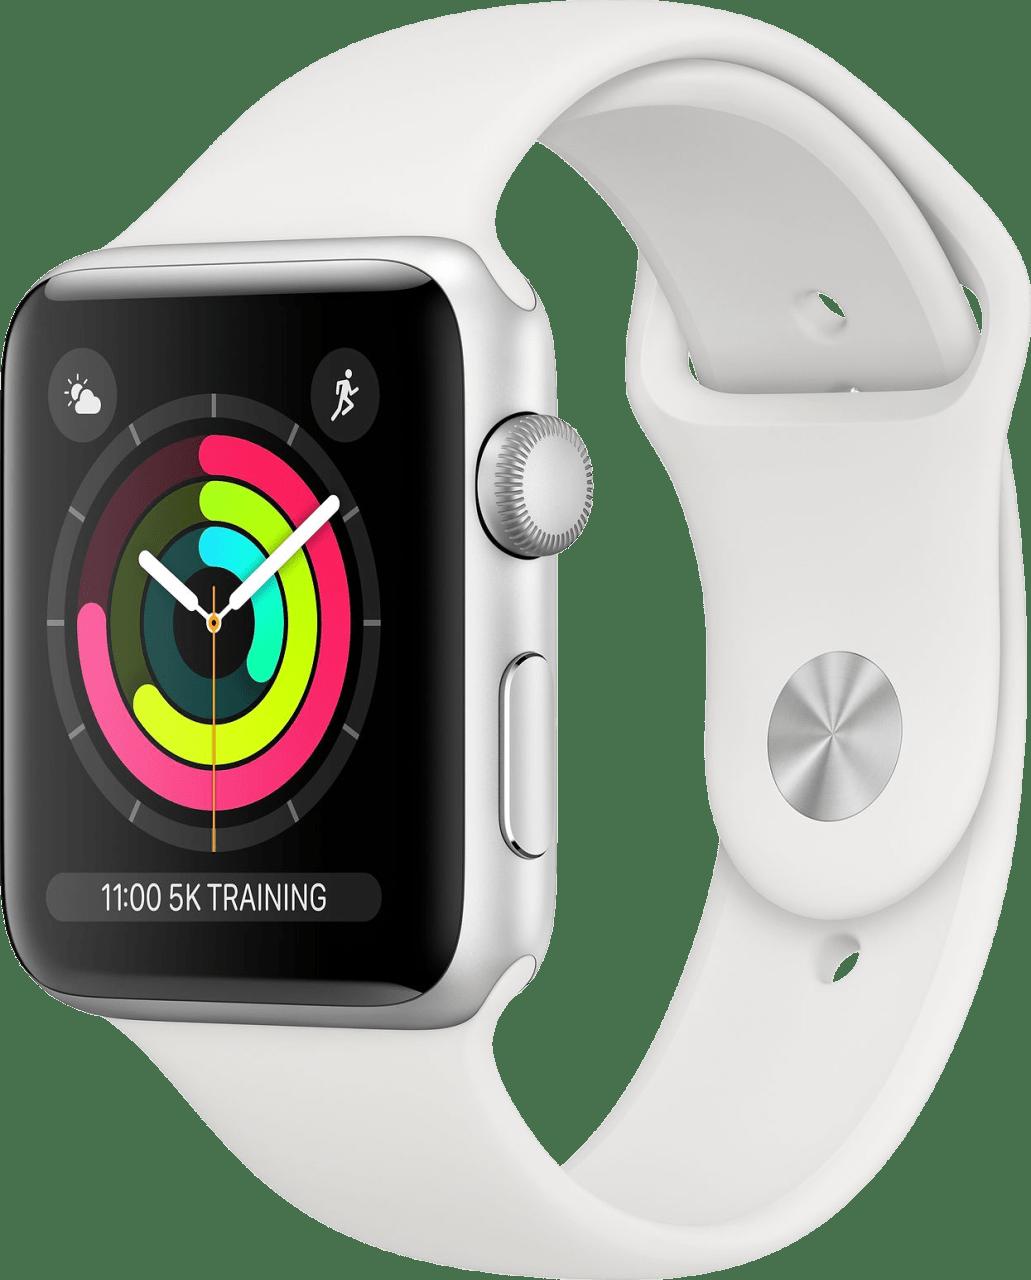 Weiß Apple Watch Serie 3 GPS, 42 mm Aluminium-Gehäuse, Sportarmband.2